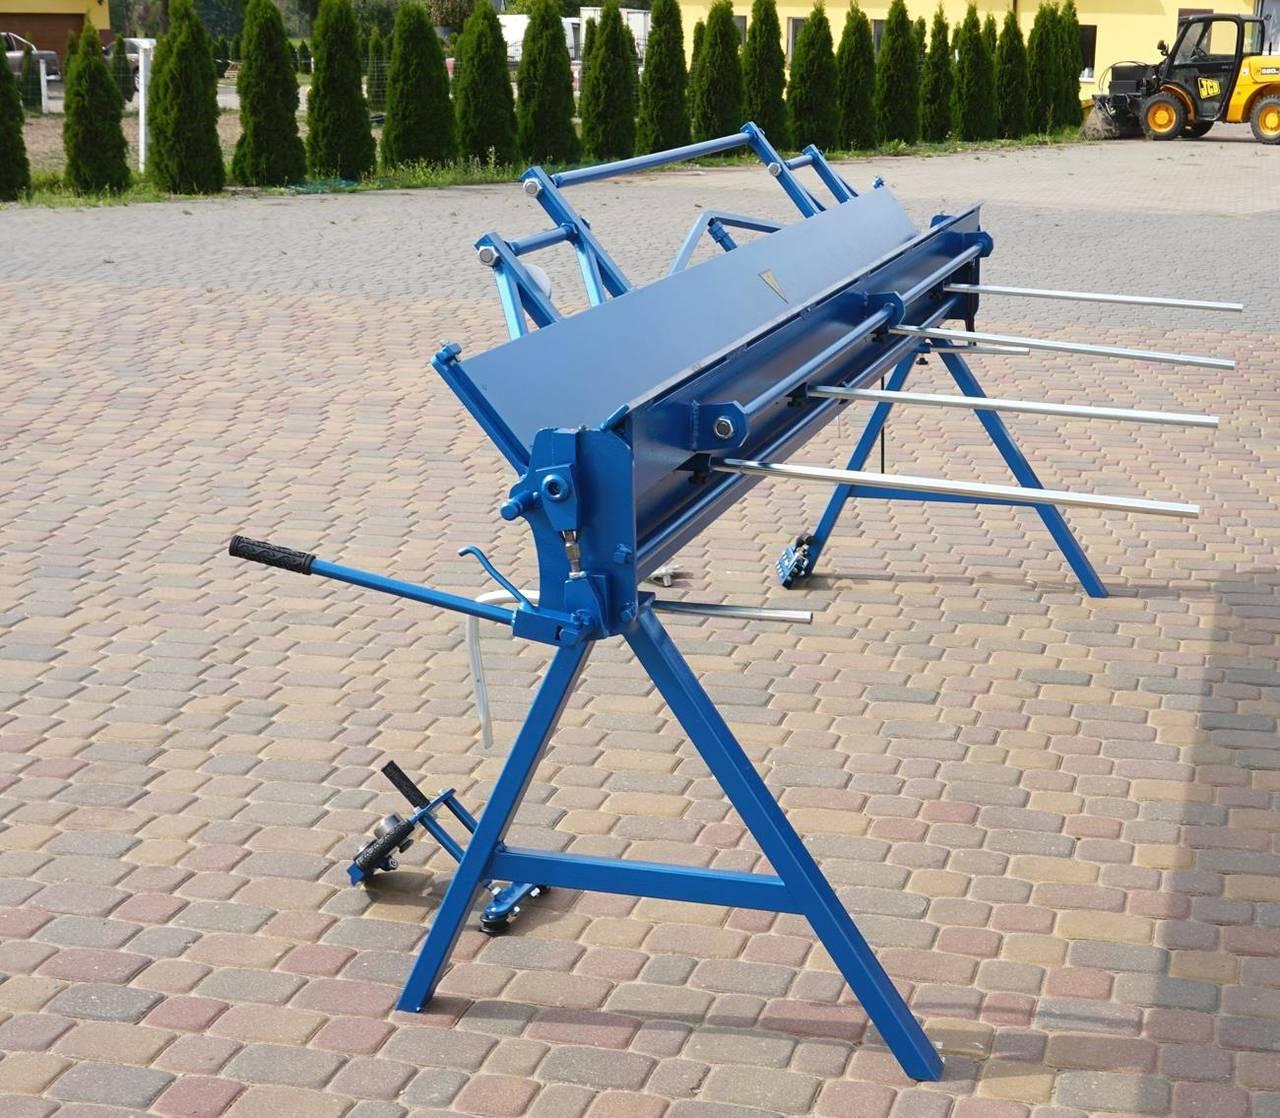 Plegadora manual, dobladora para chapa 3 metros / 1.5 aluminio  - Foto 4